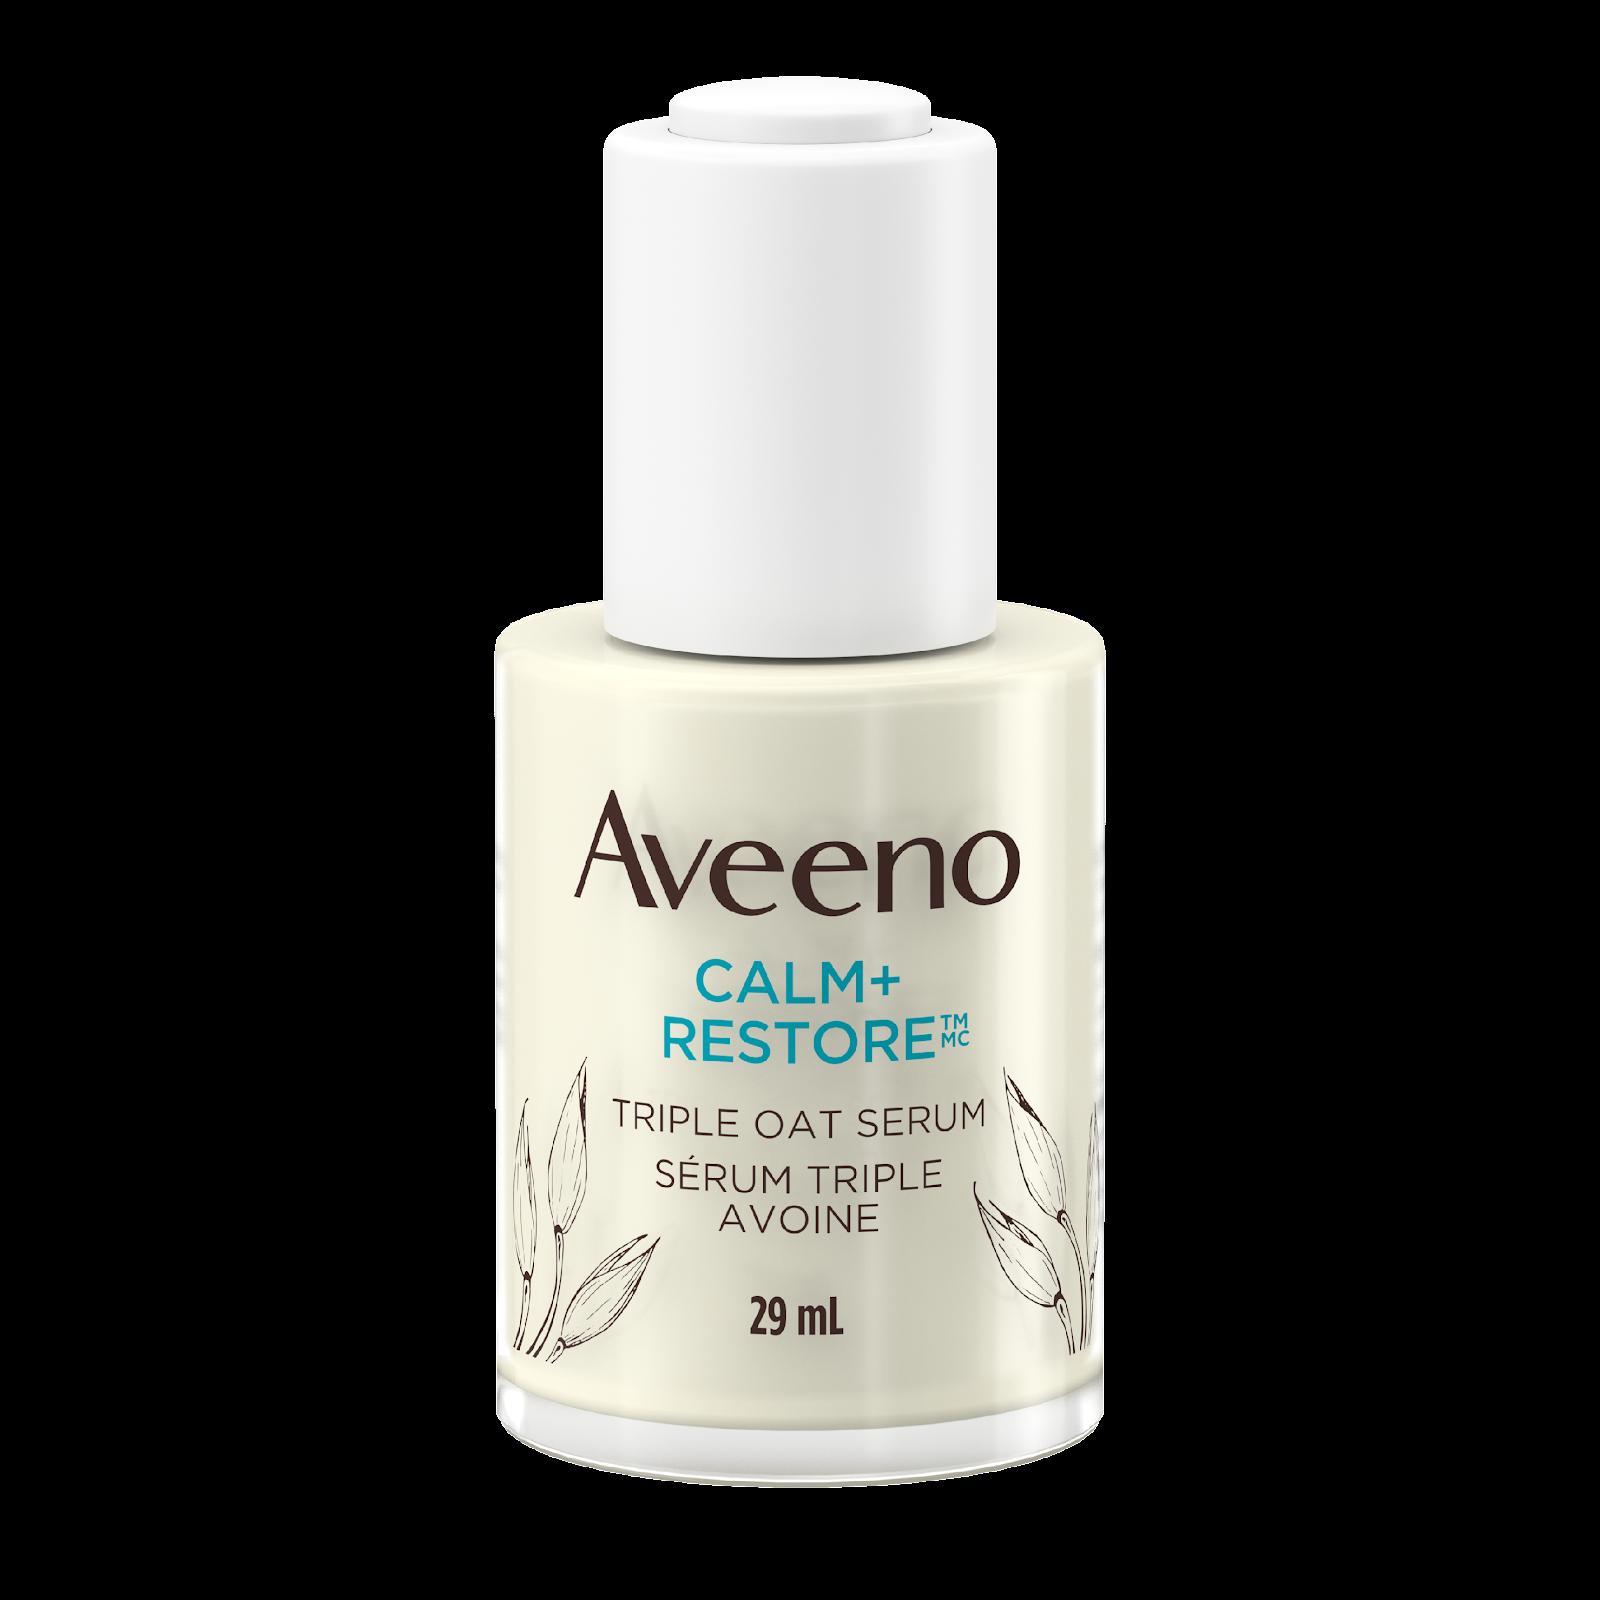 AVEENO® Calm + Restore Sensitive Skin Triple Oat Serum 29mL Bottle